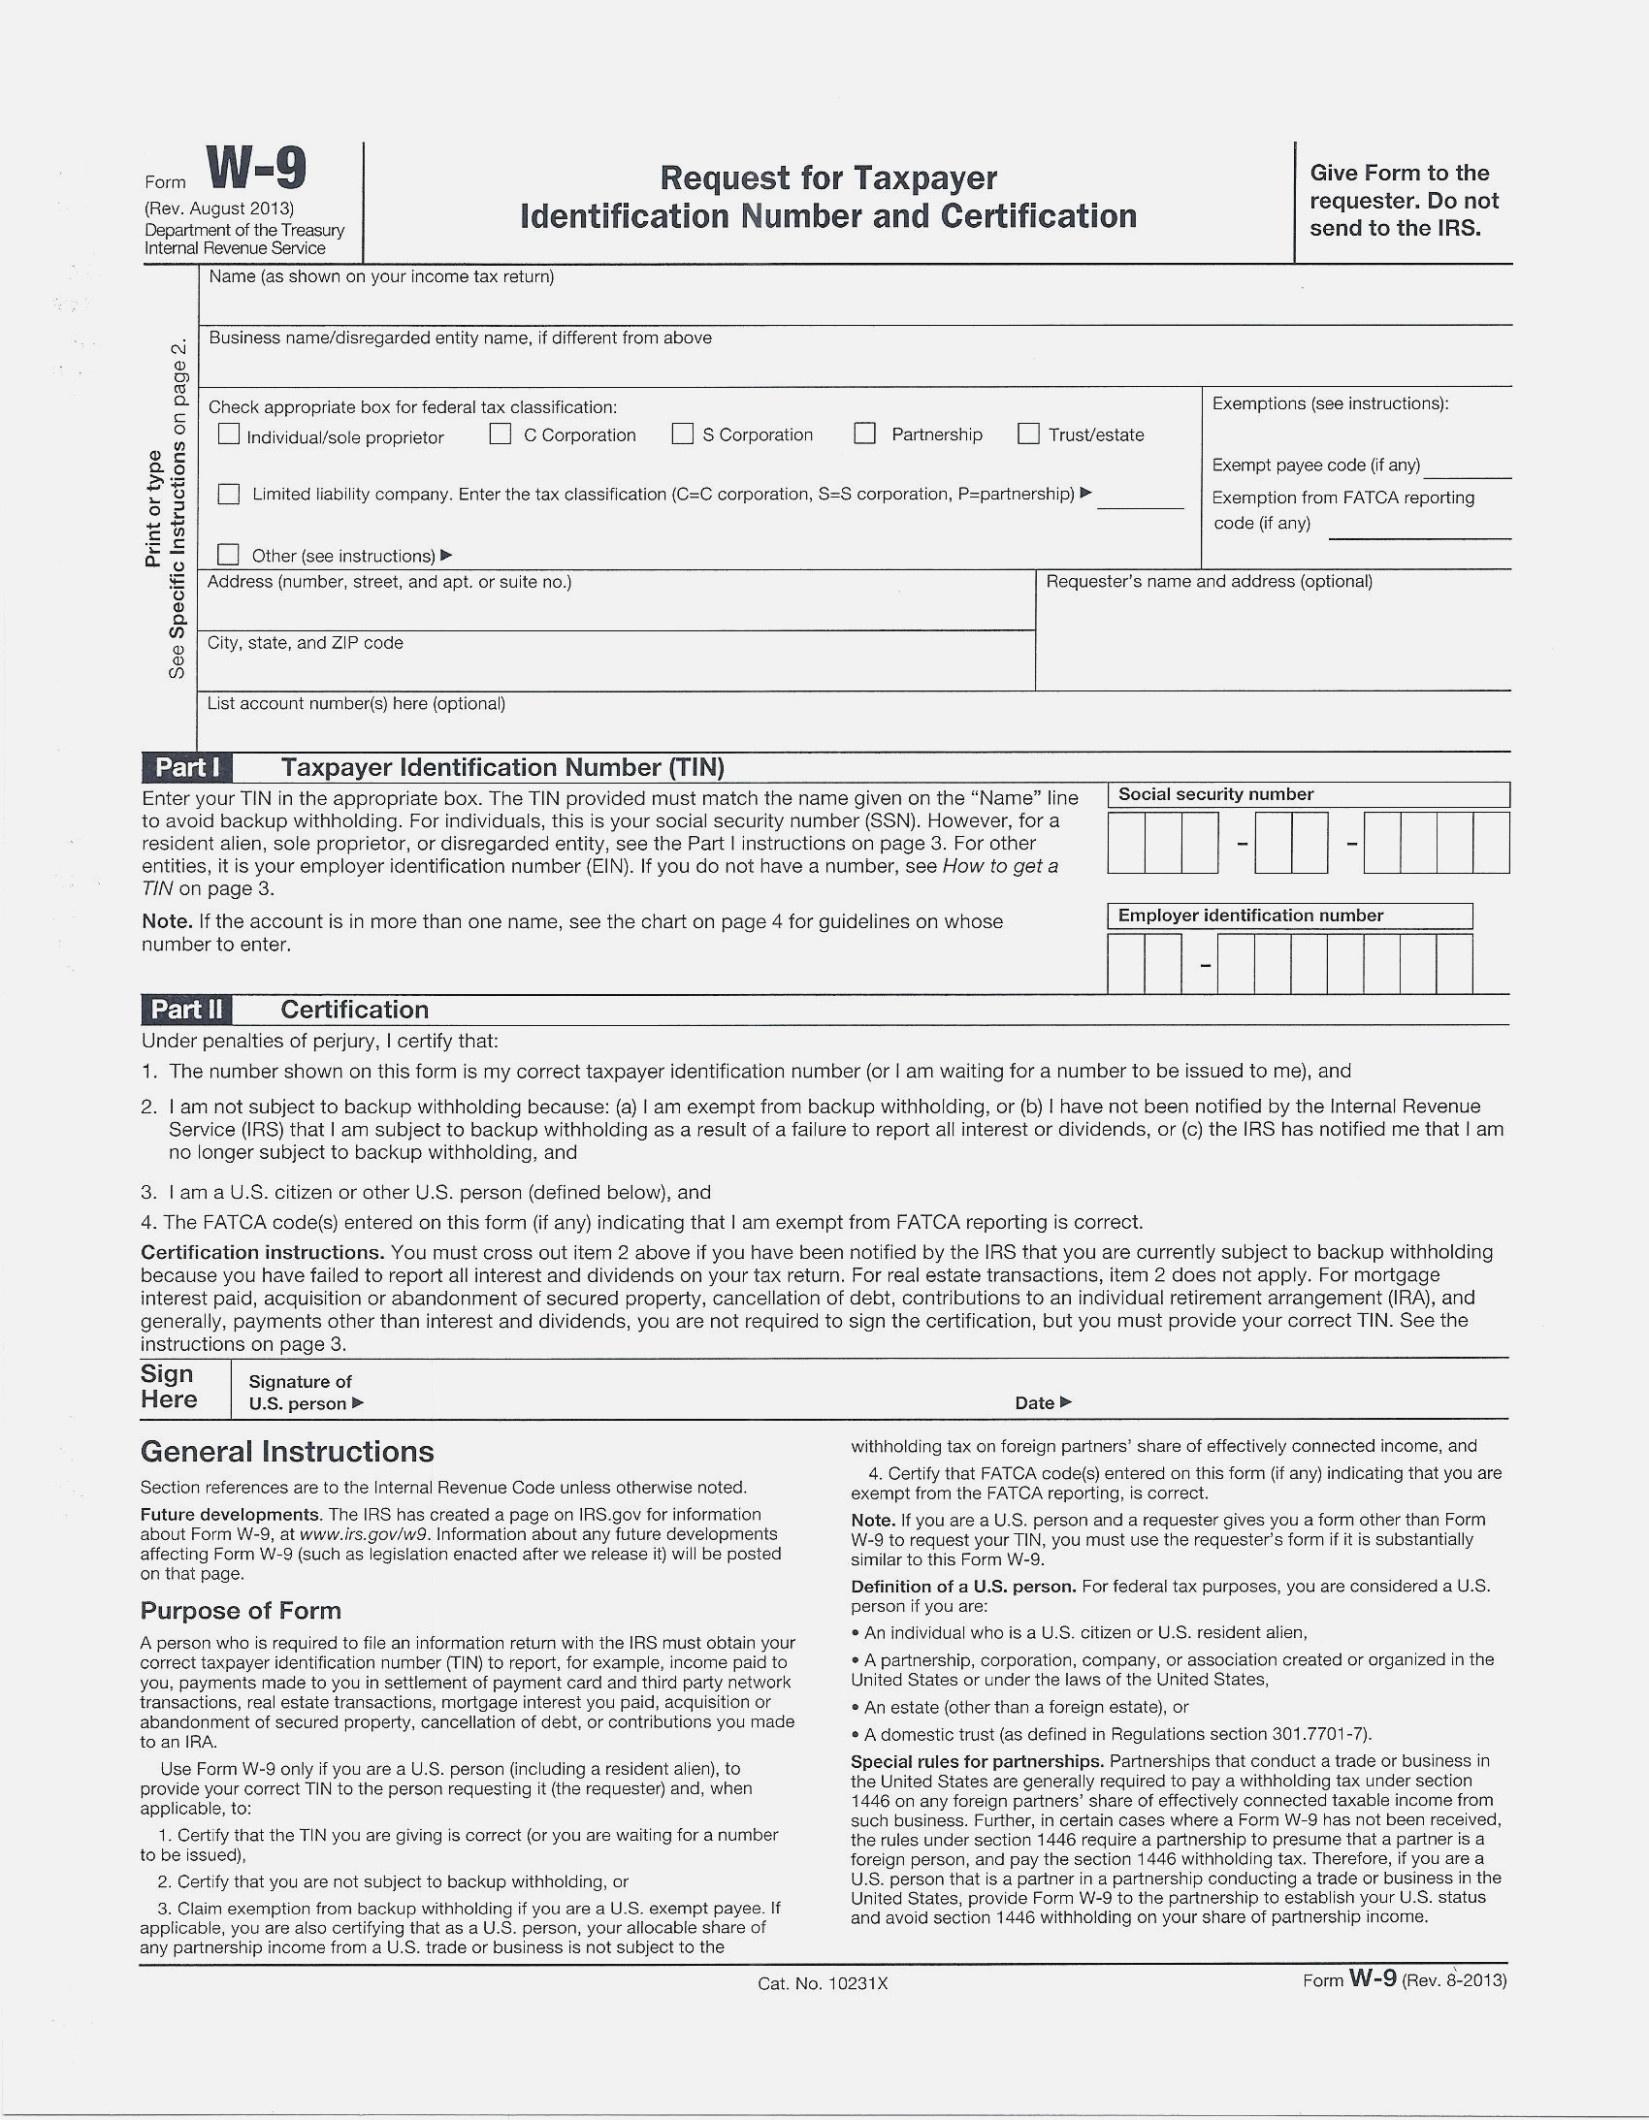 Fresh Free Printable W 14 Form   Downloadtarget – W9 Form Printable - W9 Form Printable 2017 Free